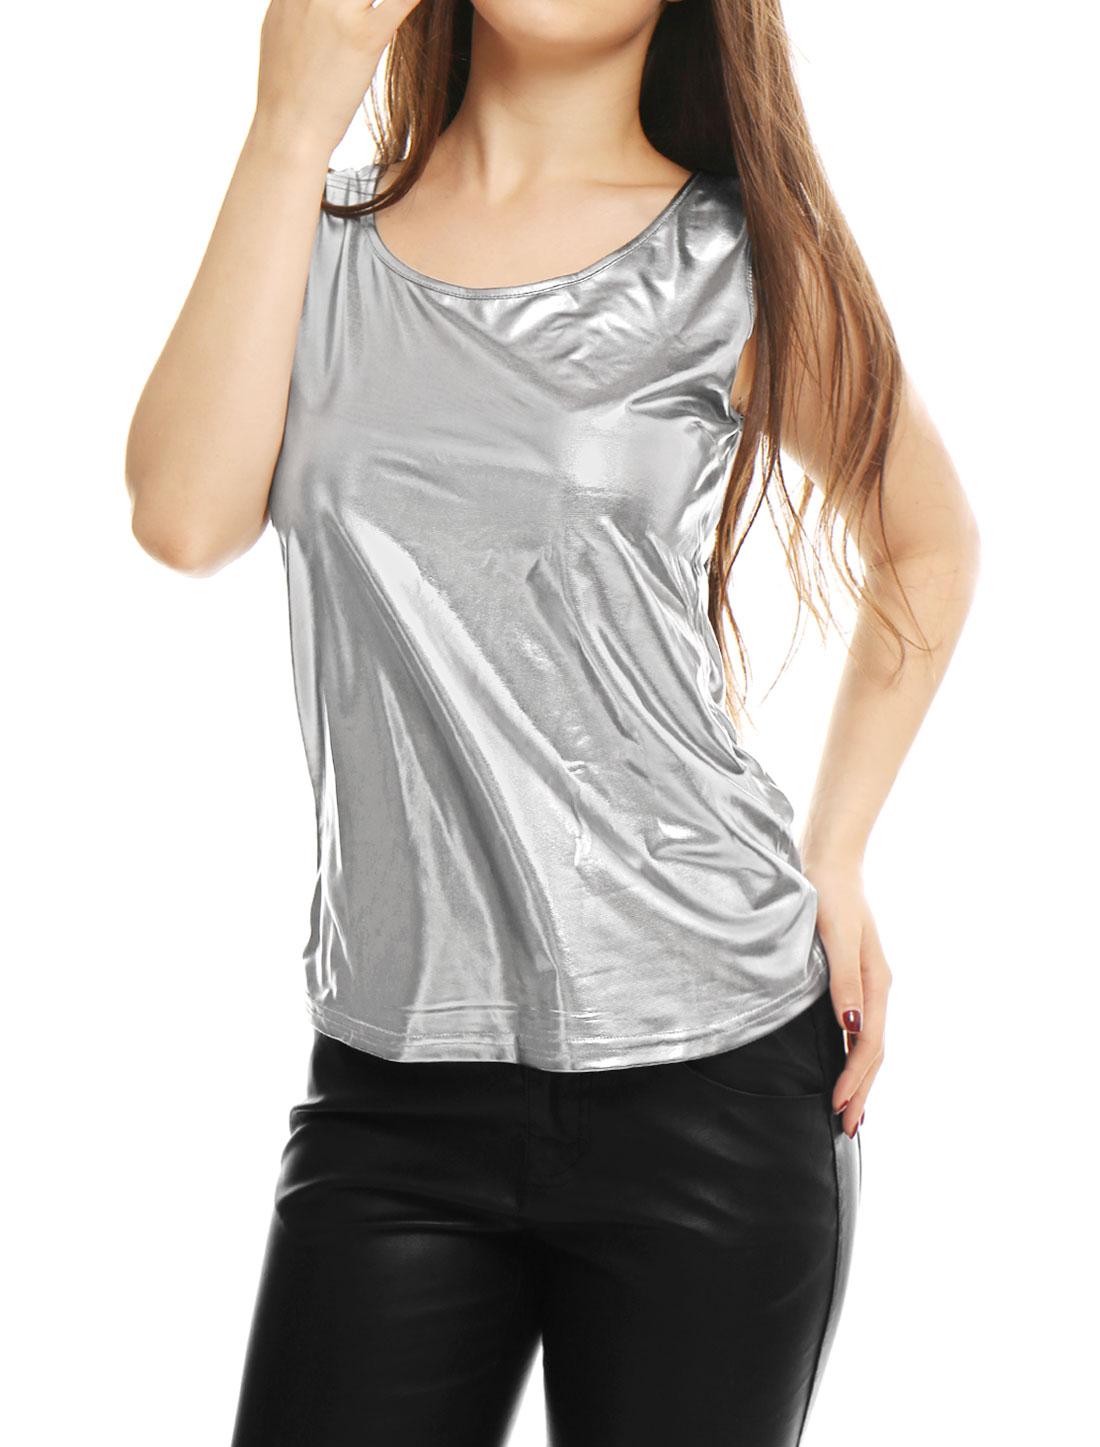 Sleeveless U Neck Stylish Metallic Tank Top for Lady Silver XS